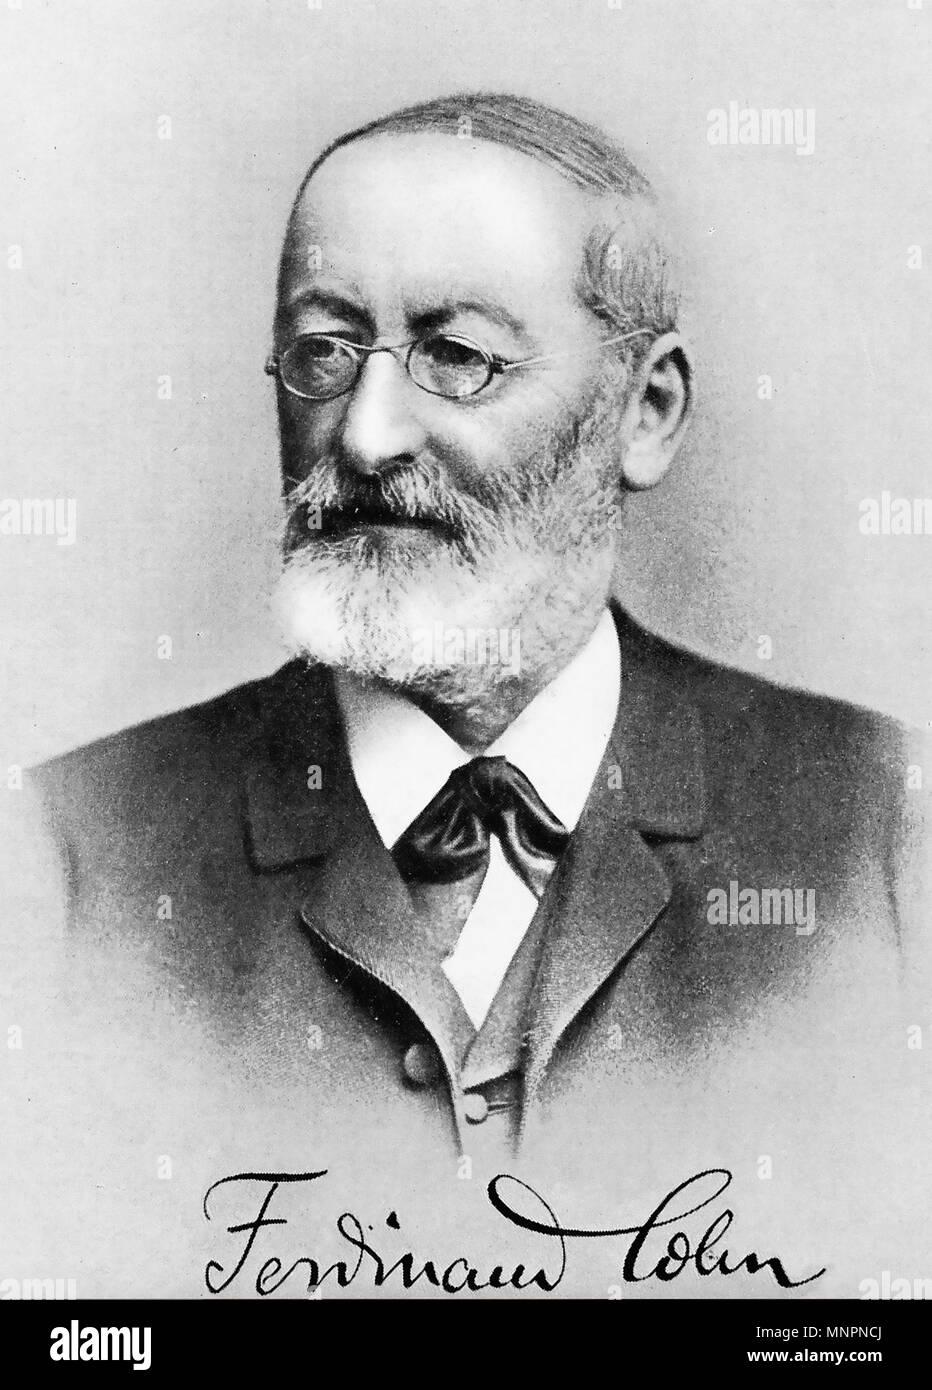 FERDINAND COHN (1828-1898) German biologist - Stock Image